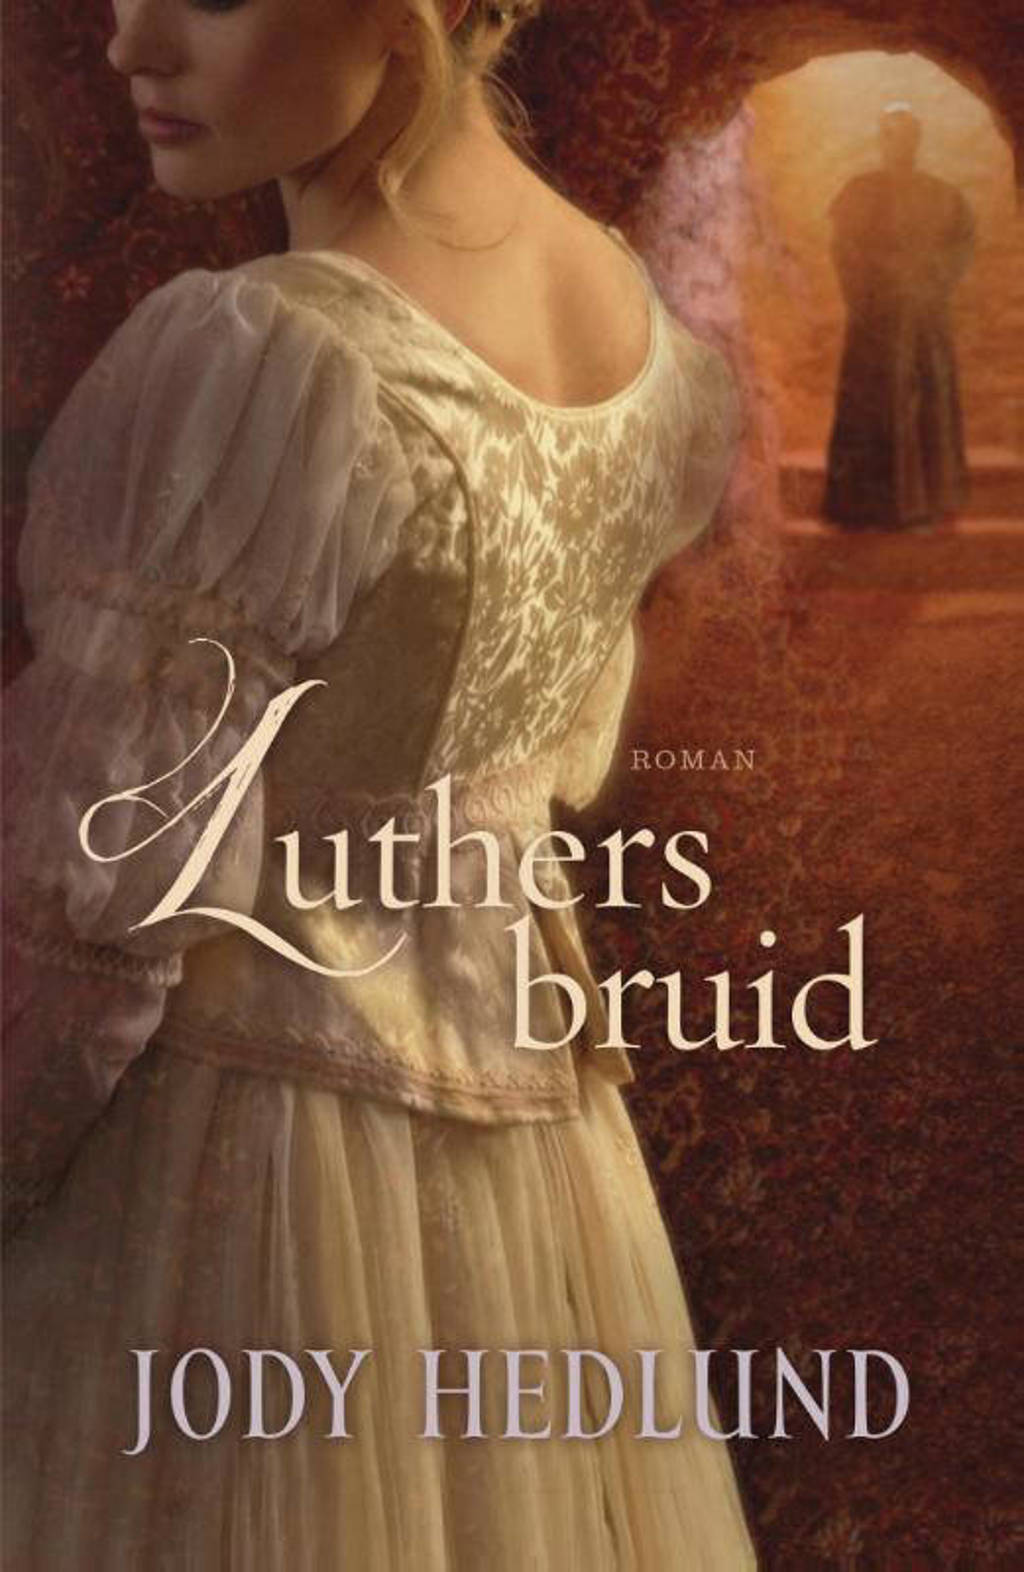 Luthers bruid - Jody Hedlund